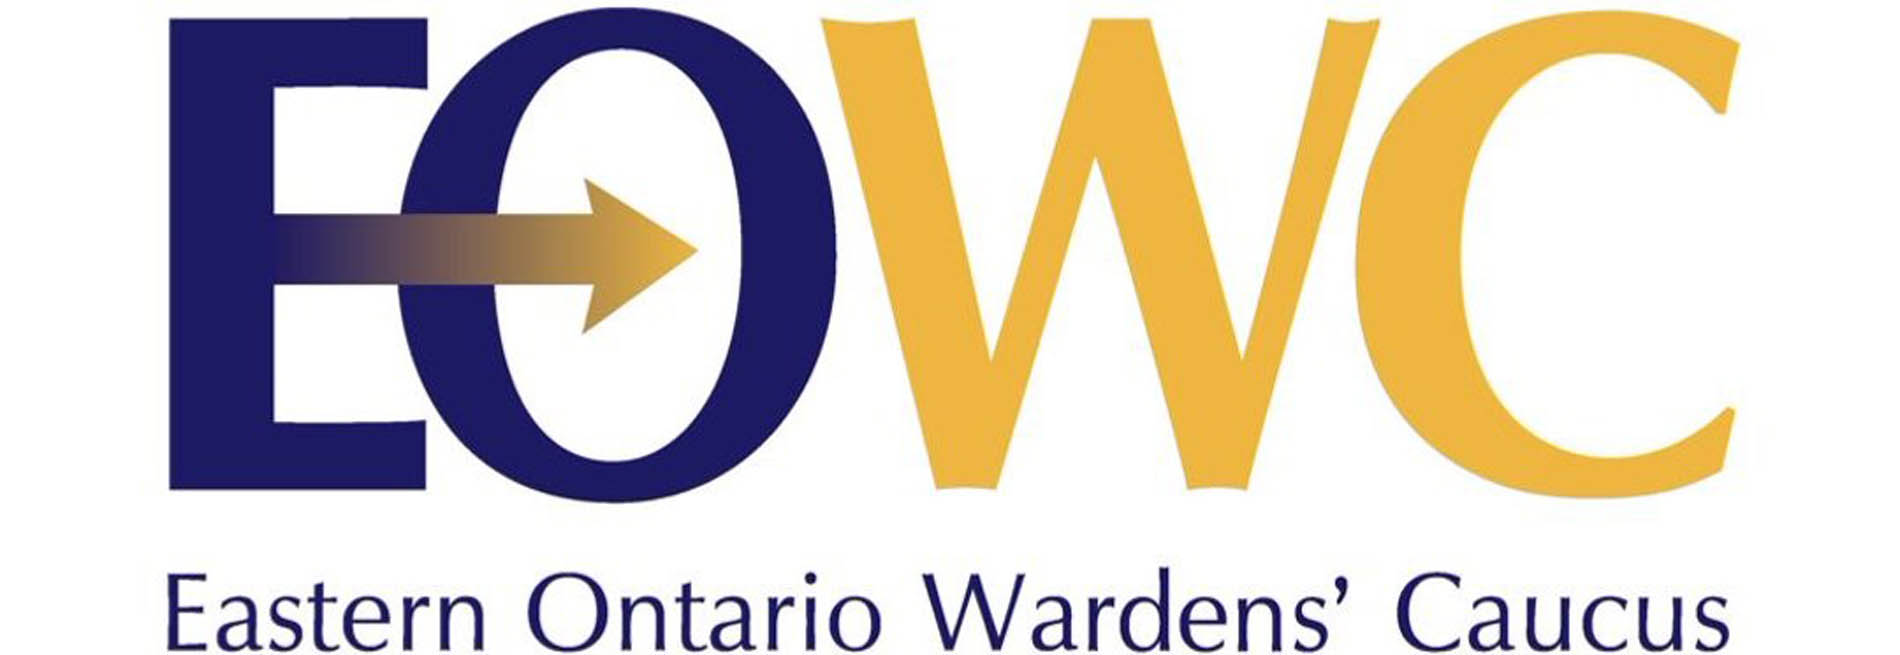 Eastern Ontario Wardens Caucus Logo